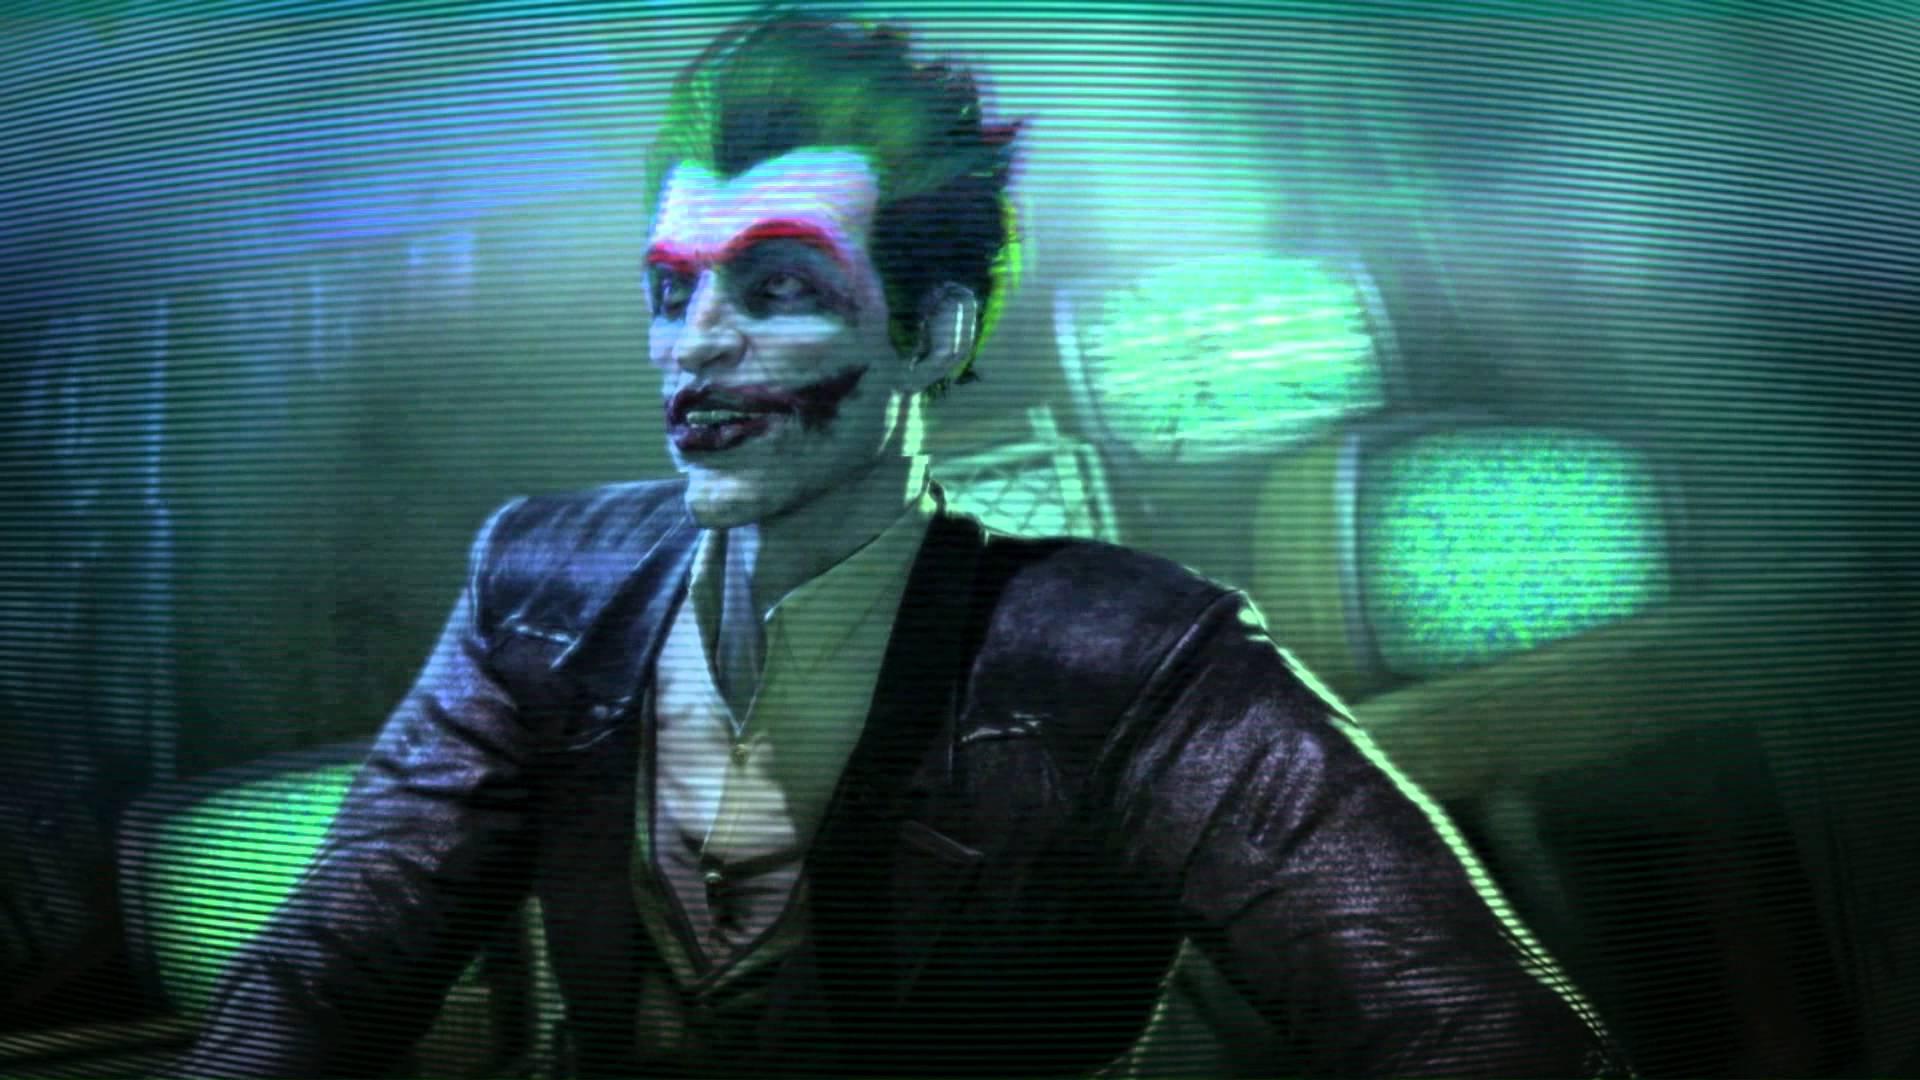 batman arkham origins joker hd wallpapers - wallpaper cave